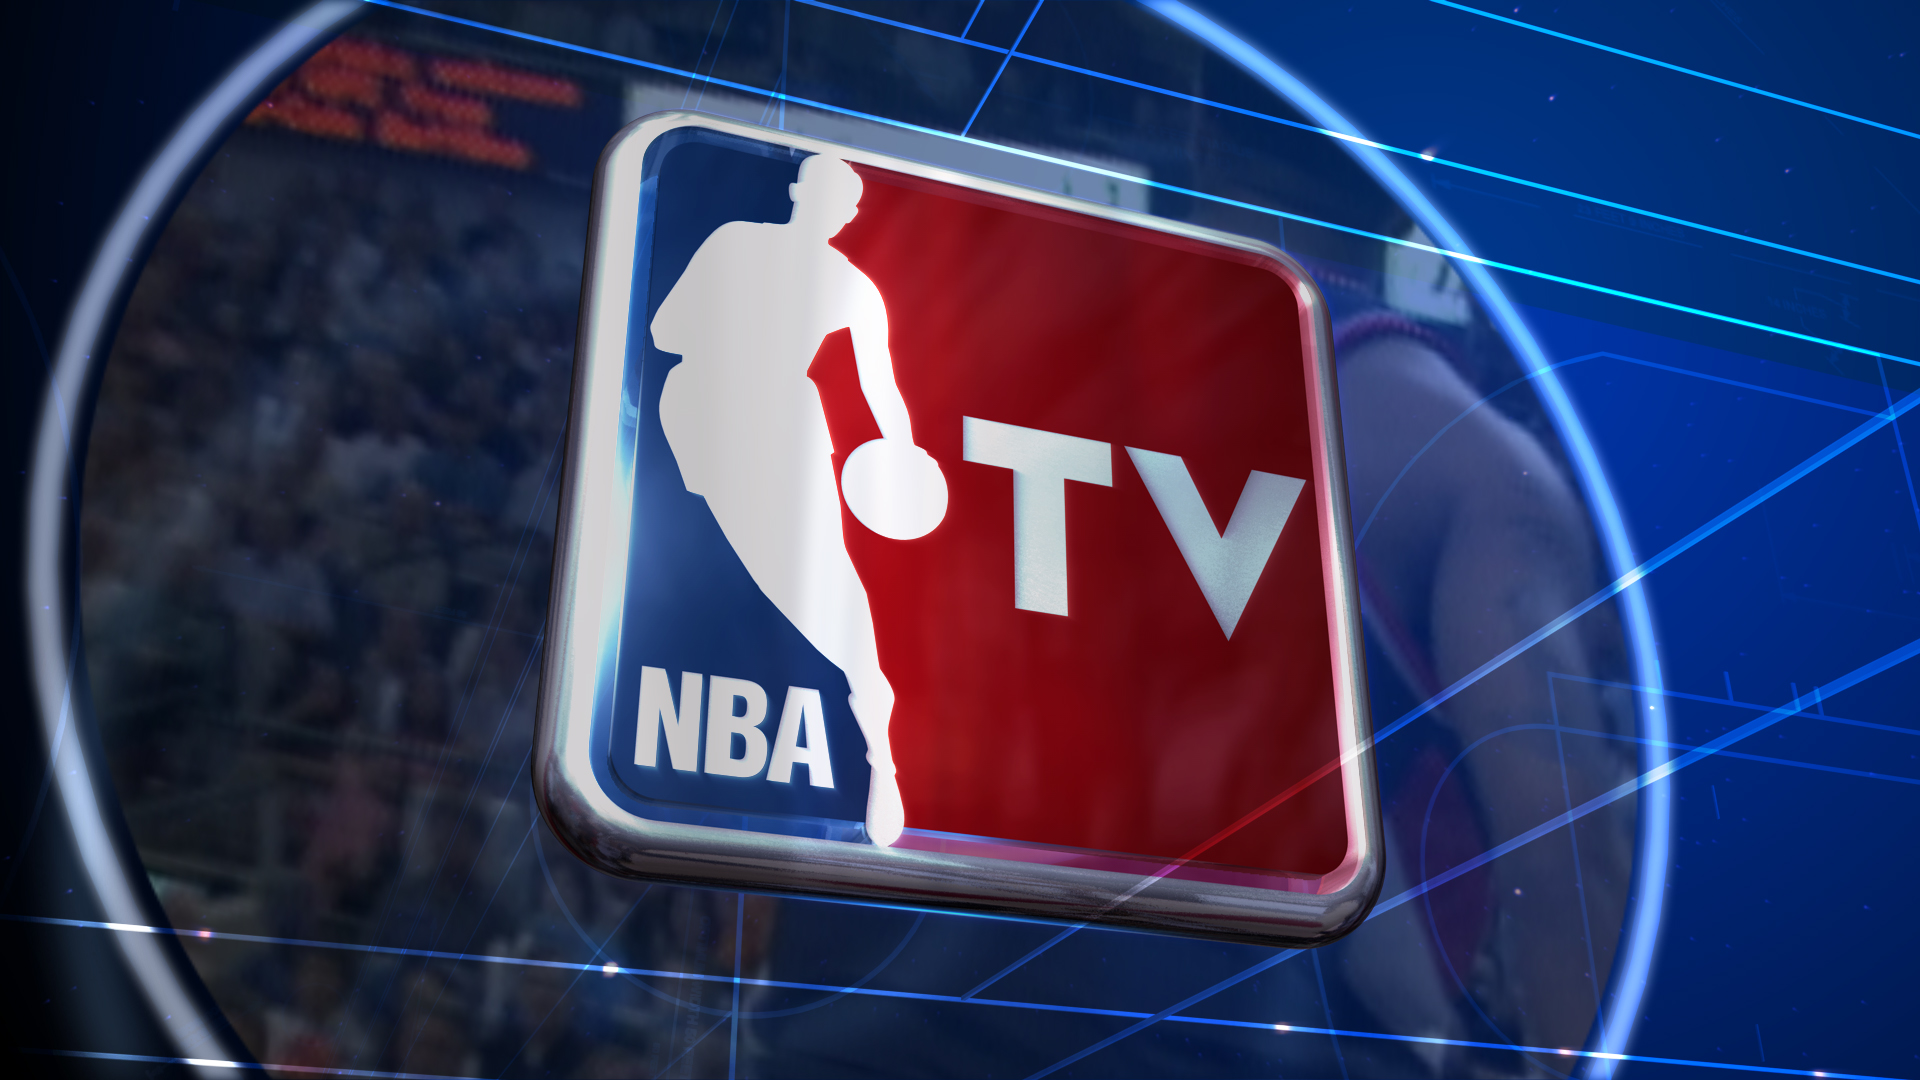 НБА. Моменты 23-29 мая